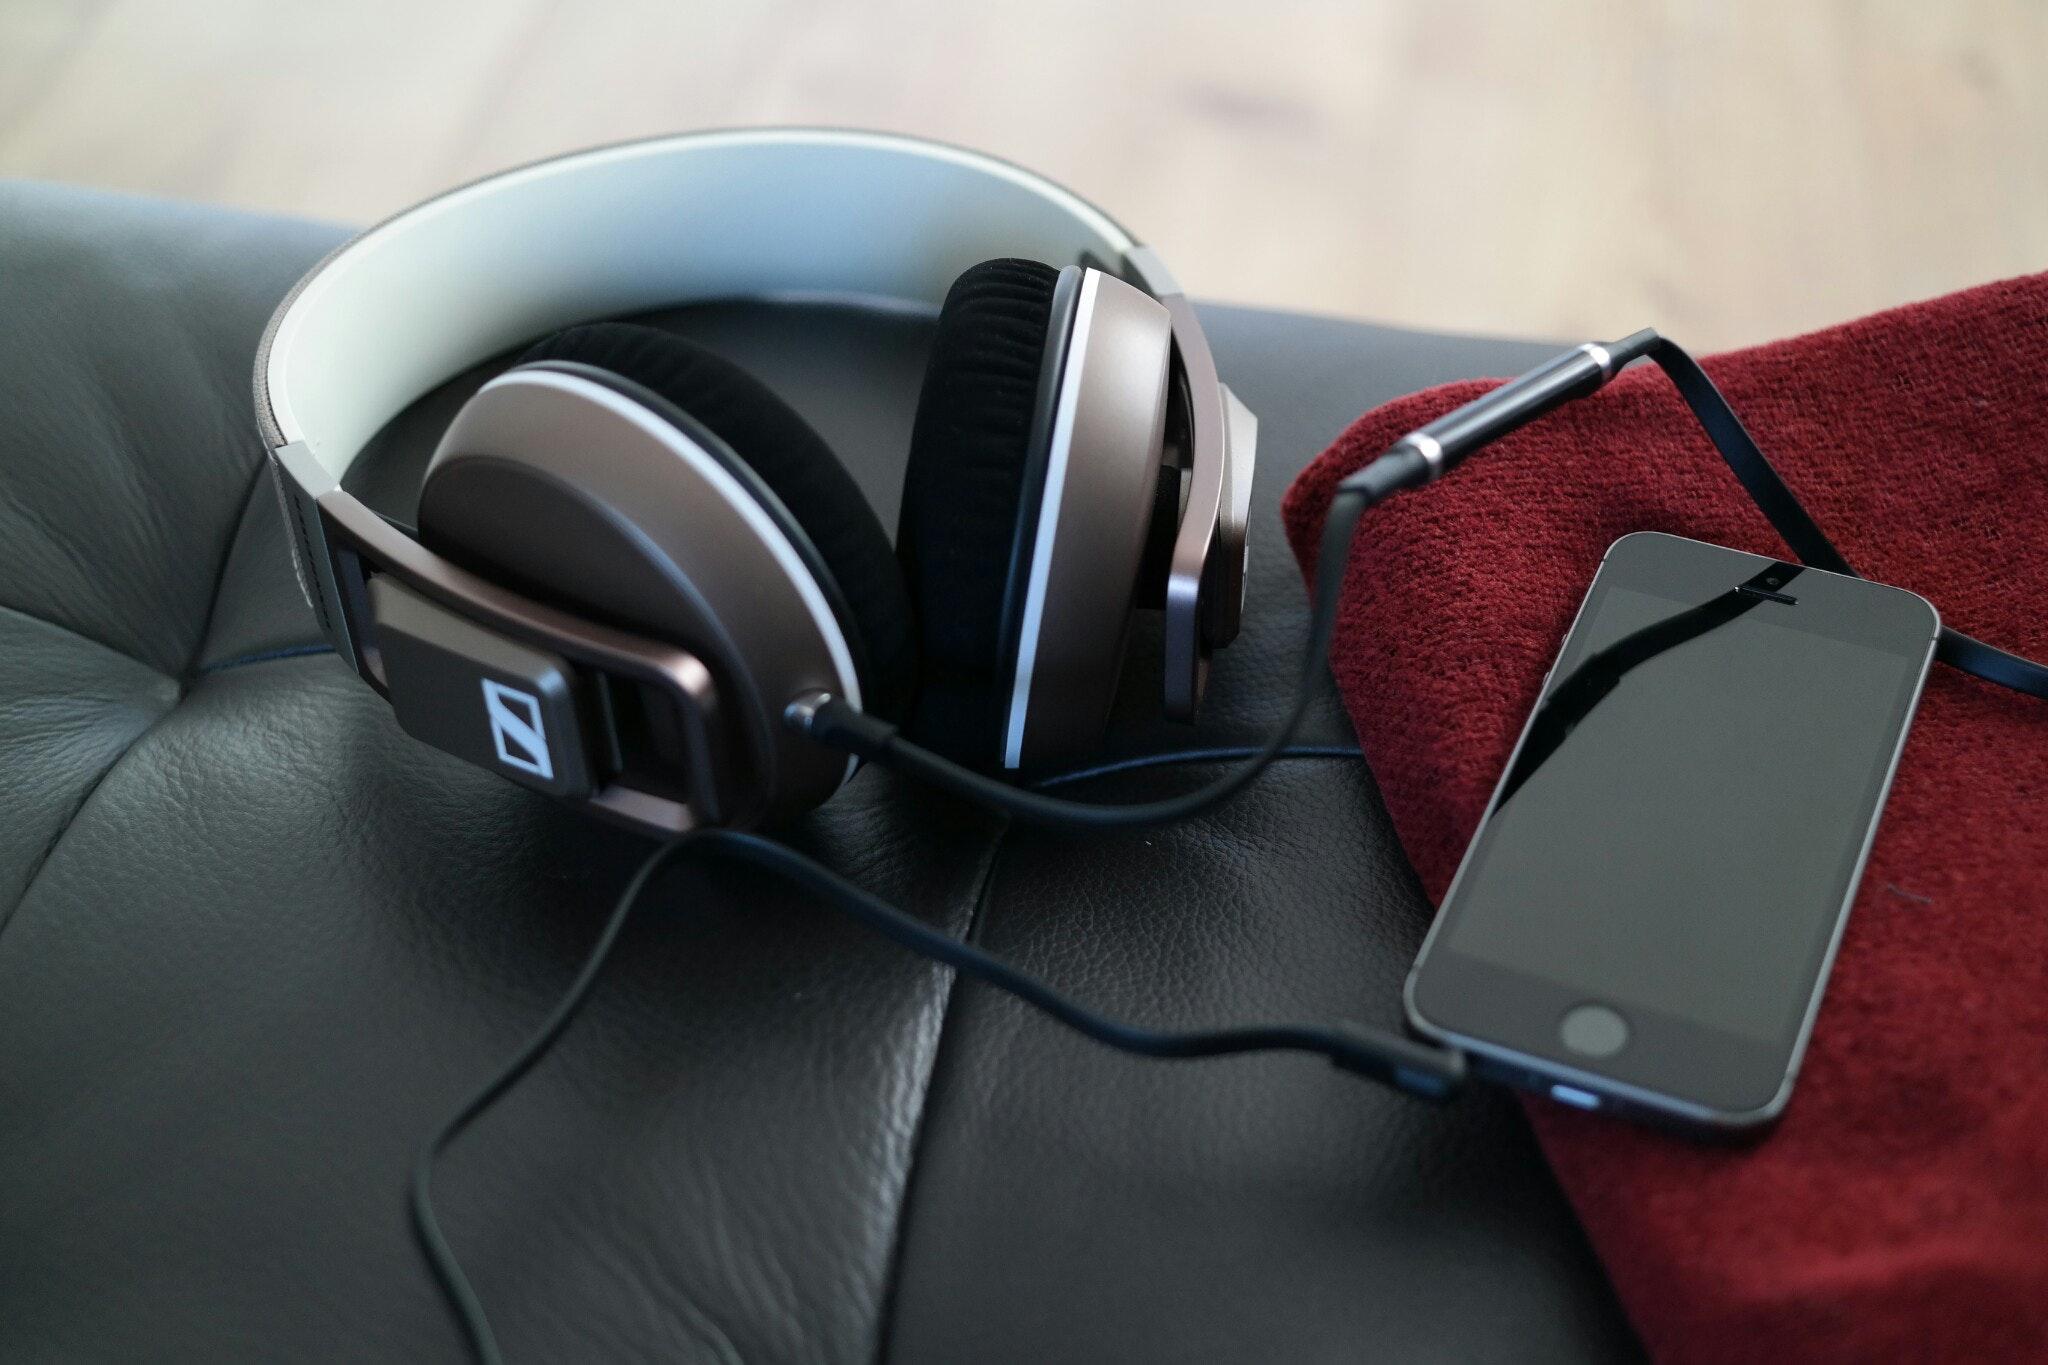 headphone-iphone-iphone-5s-845169.jpg